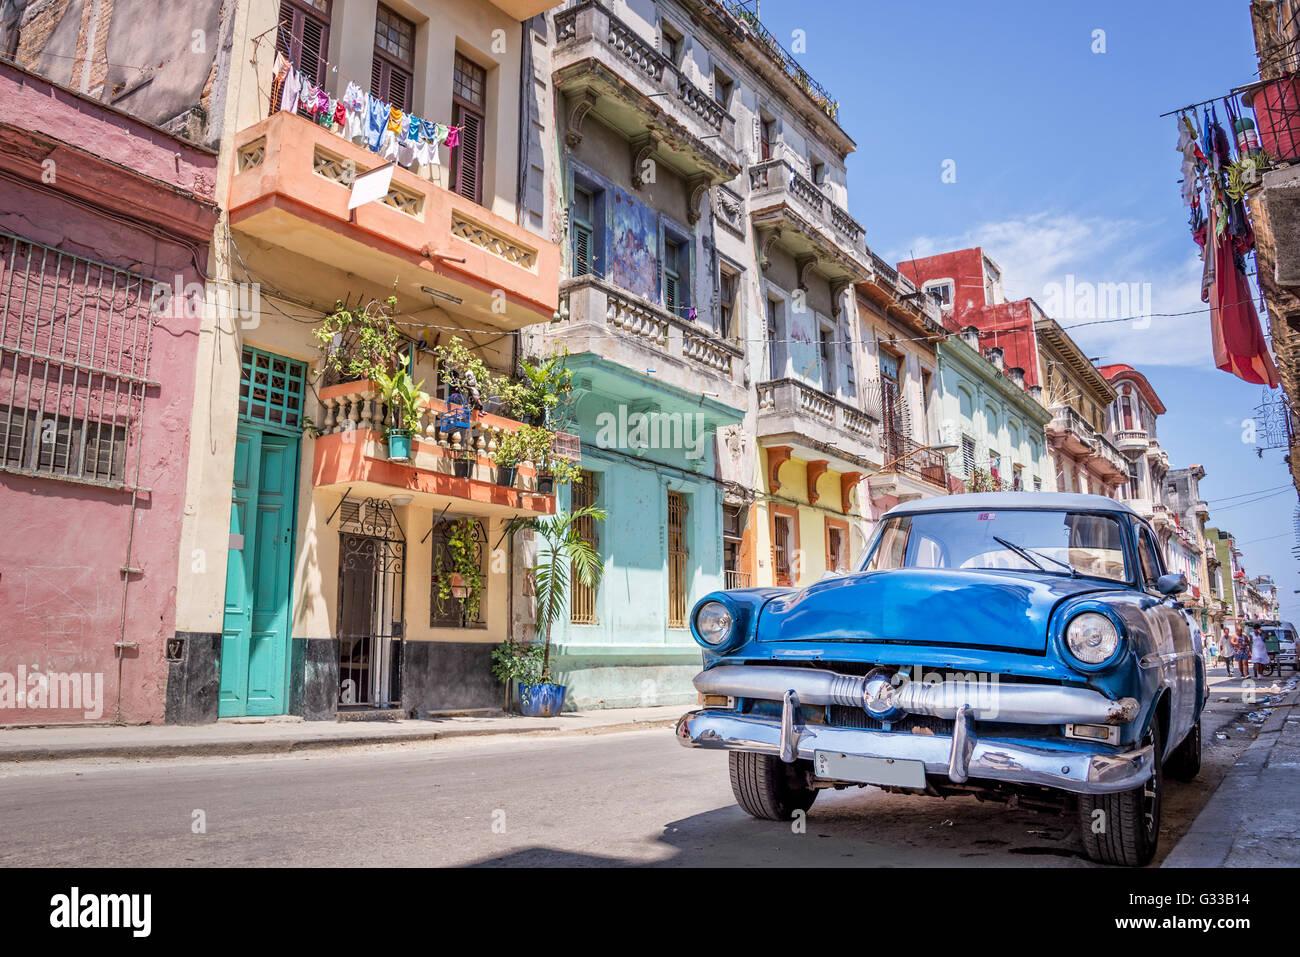 Vintage classic american car in Havana, Cuba - Stock Image